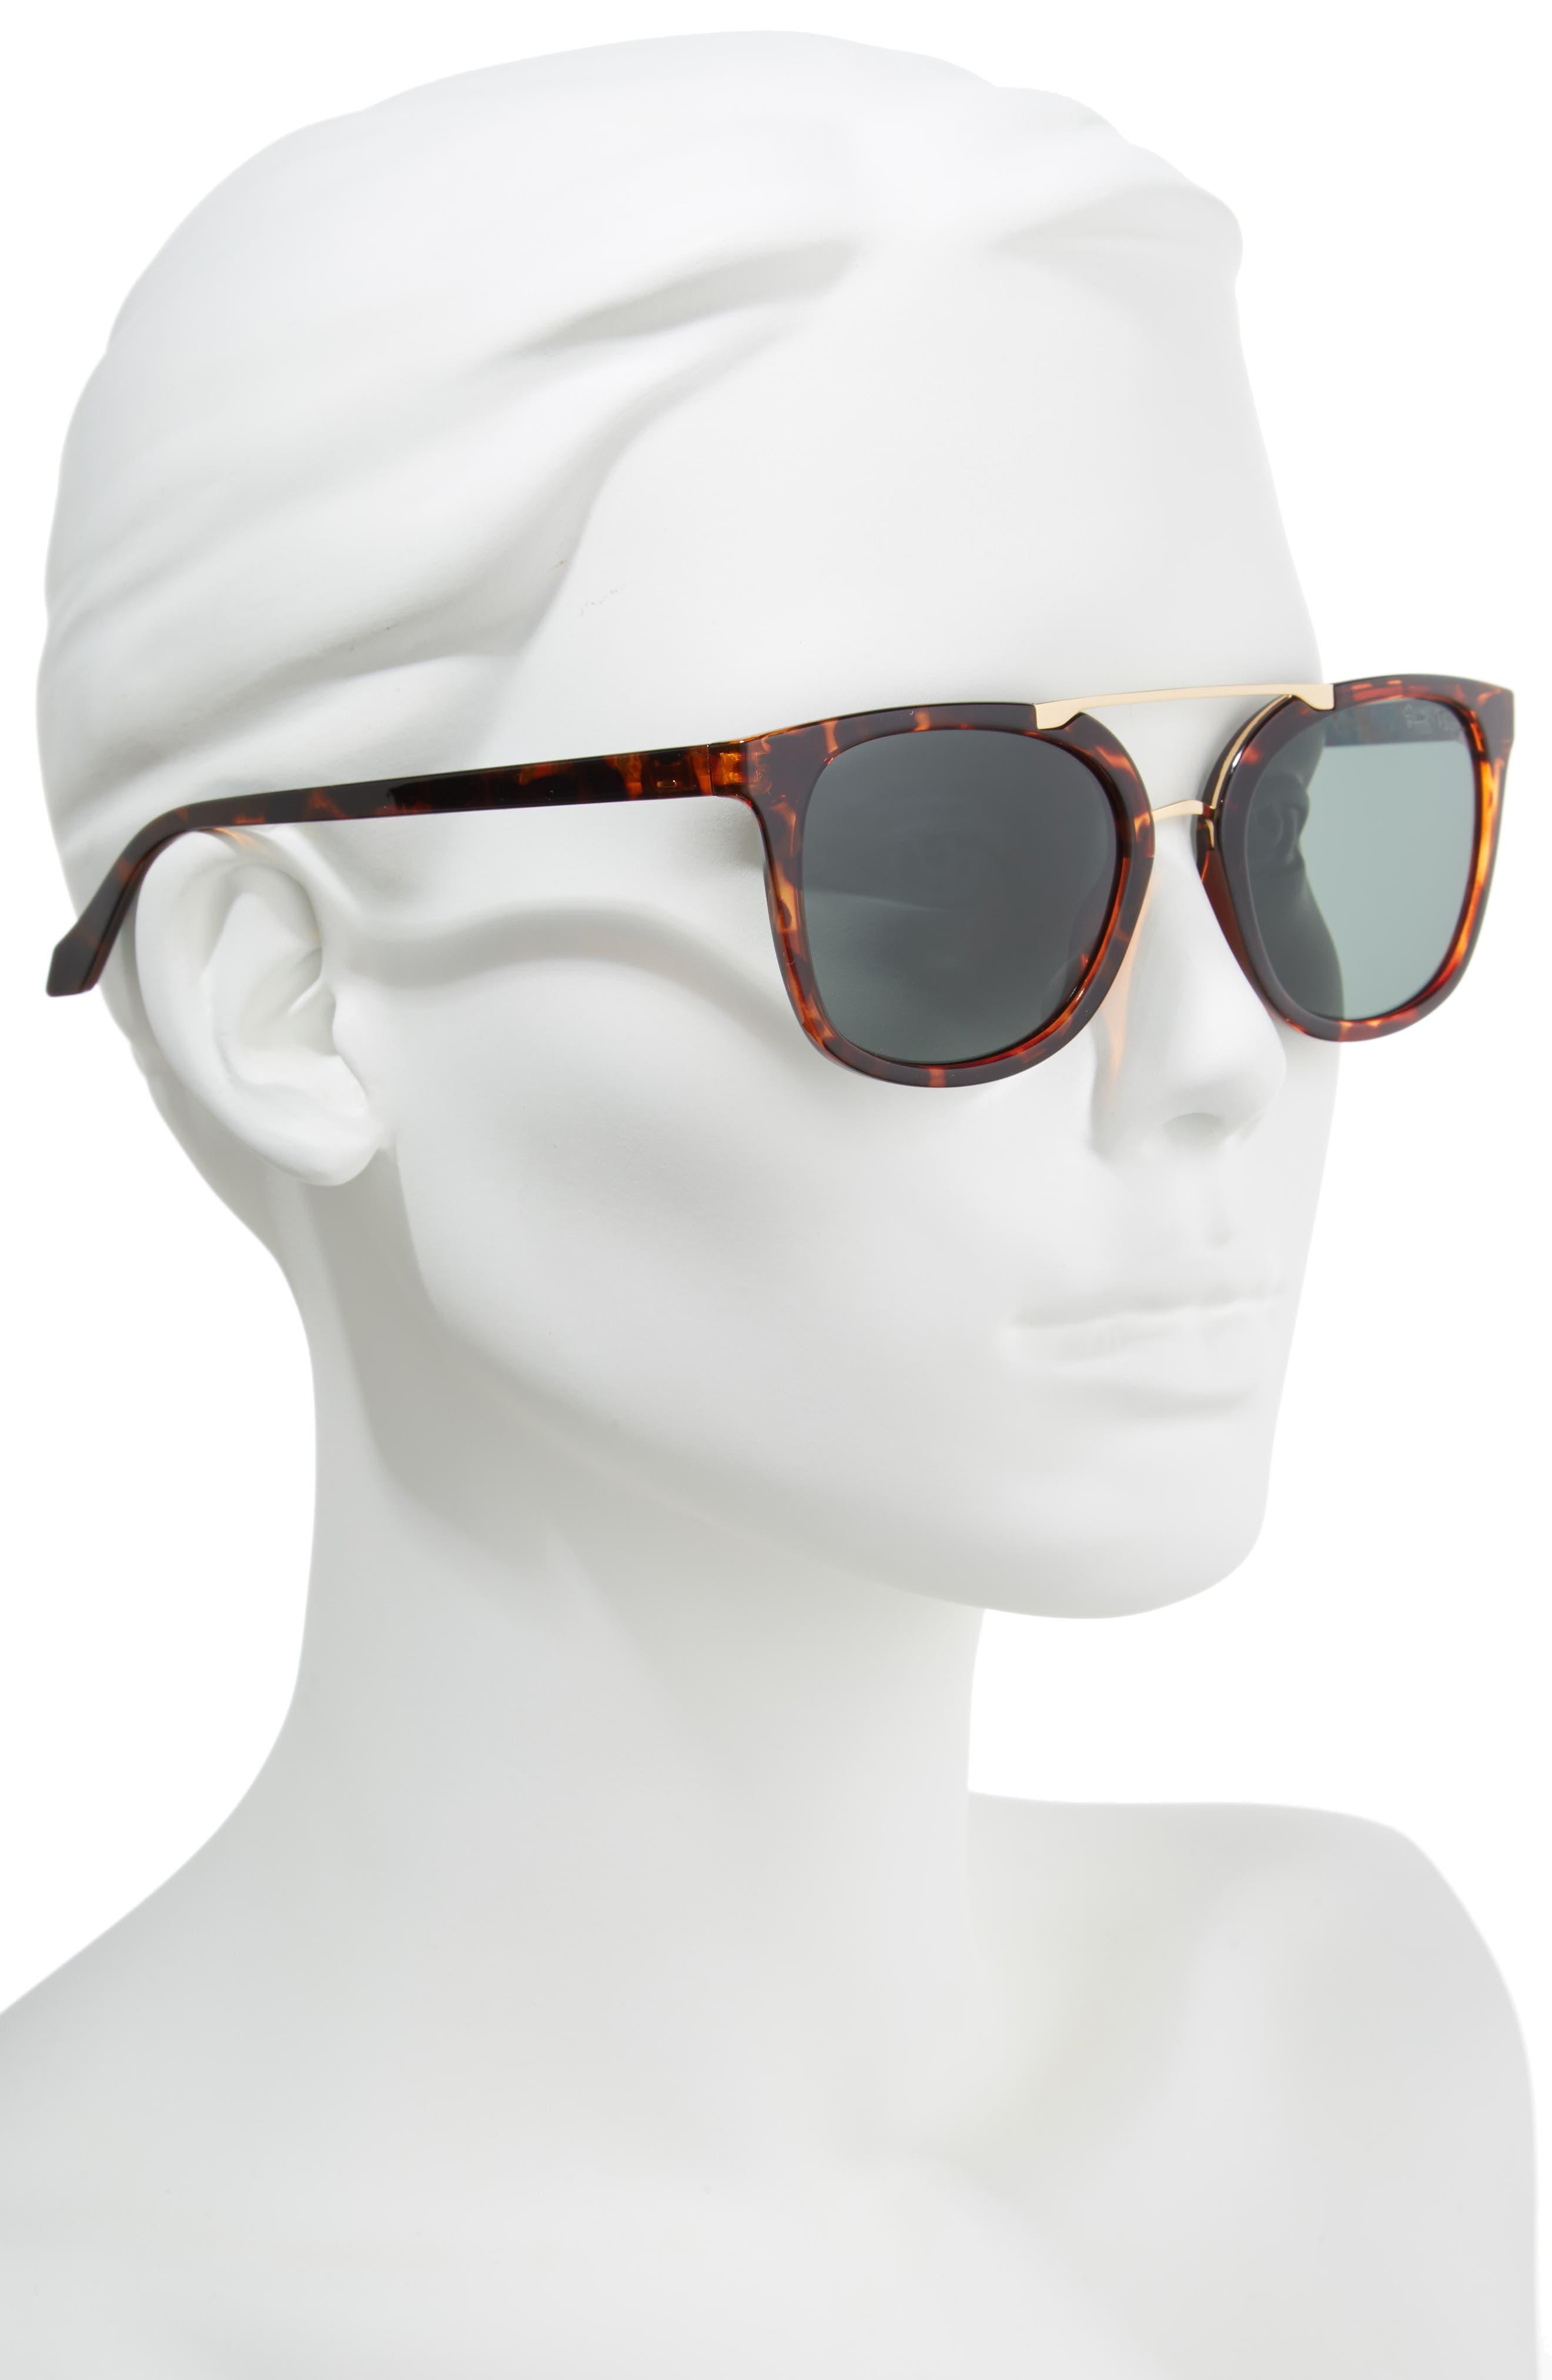 Lilly Pulitzer Emilia 53mm Polarized Sunglasses,                             Alternate thumbnail 2, color,                             DARK TORTOISE/ GREEN